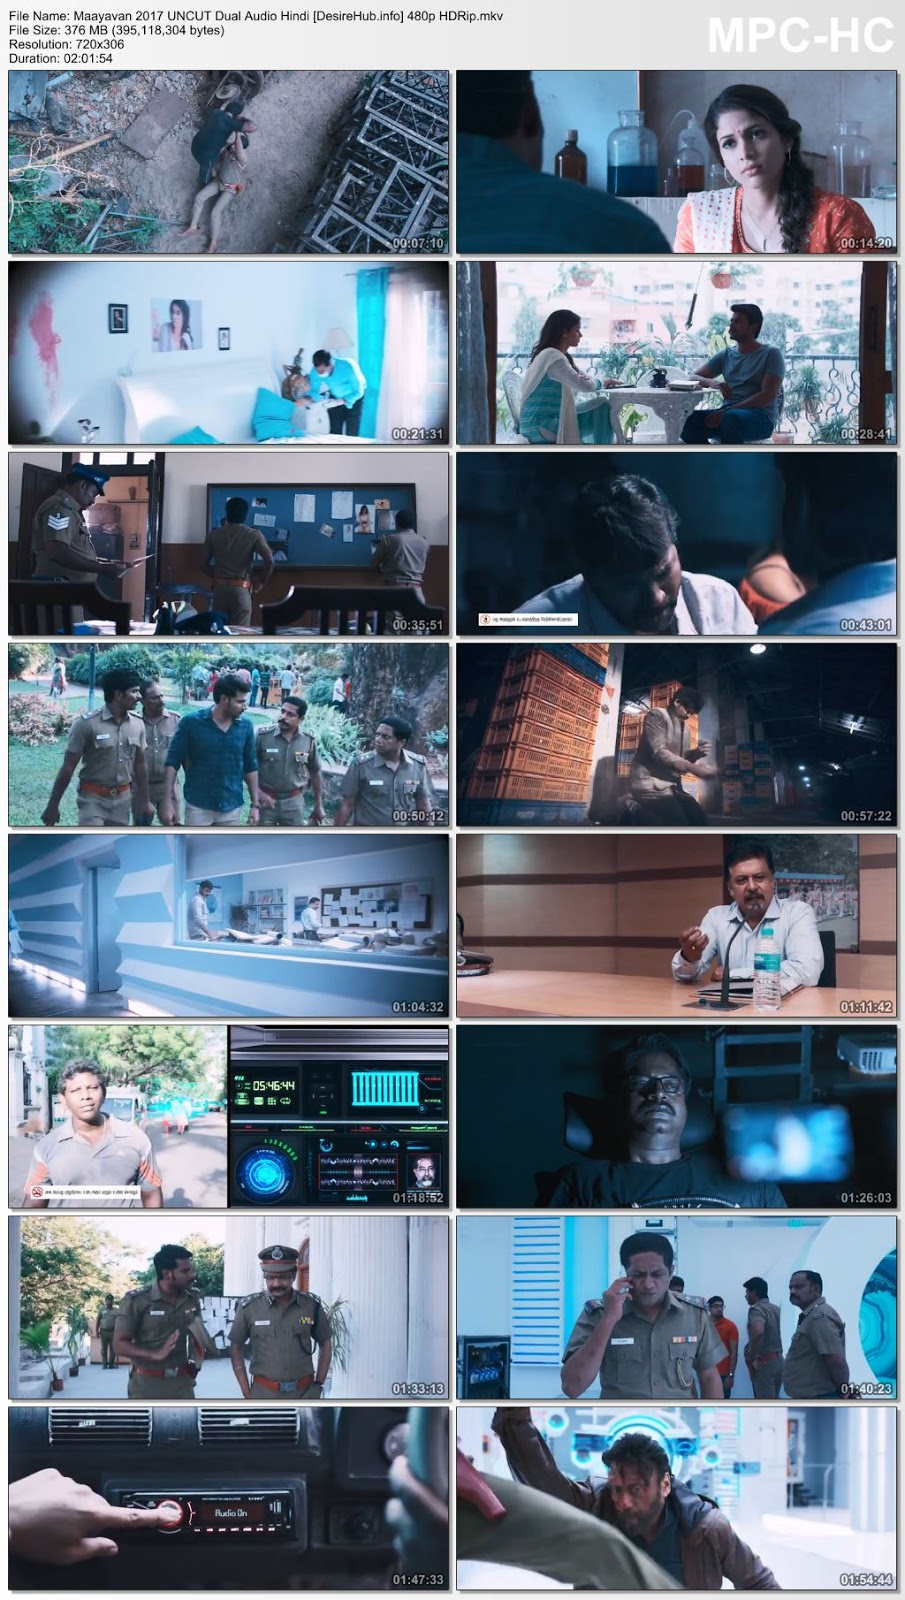 Maayavan 2017 UNCUT Dual Audio Hindi 720p HDRip 990MB Desirehub